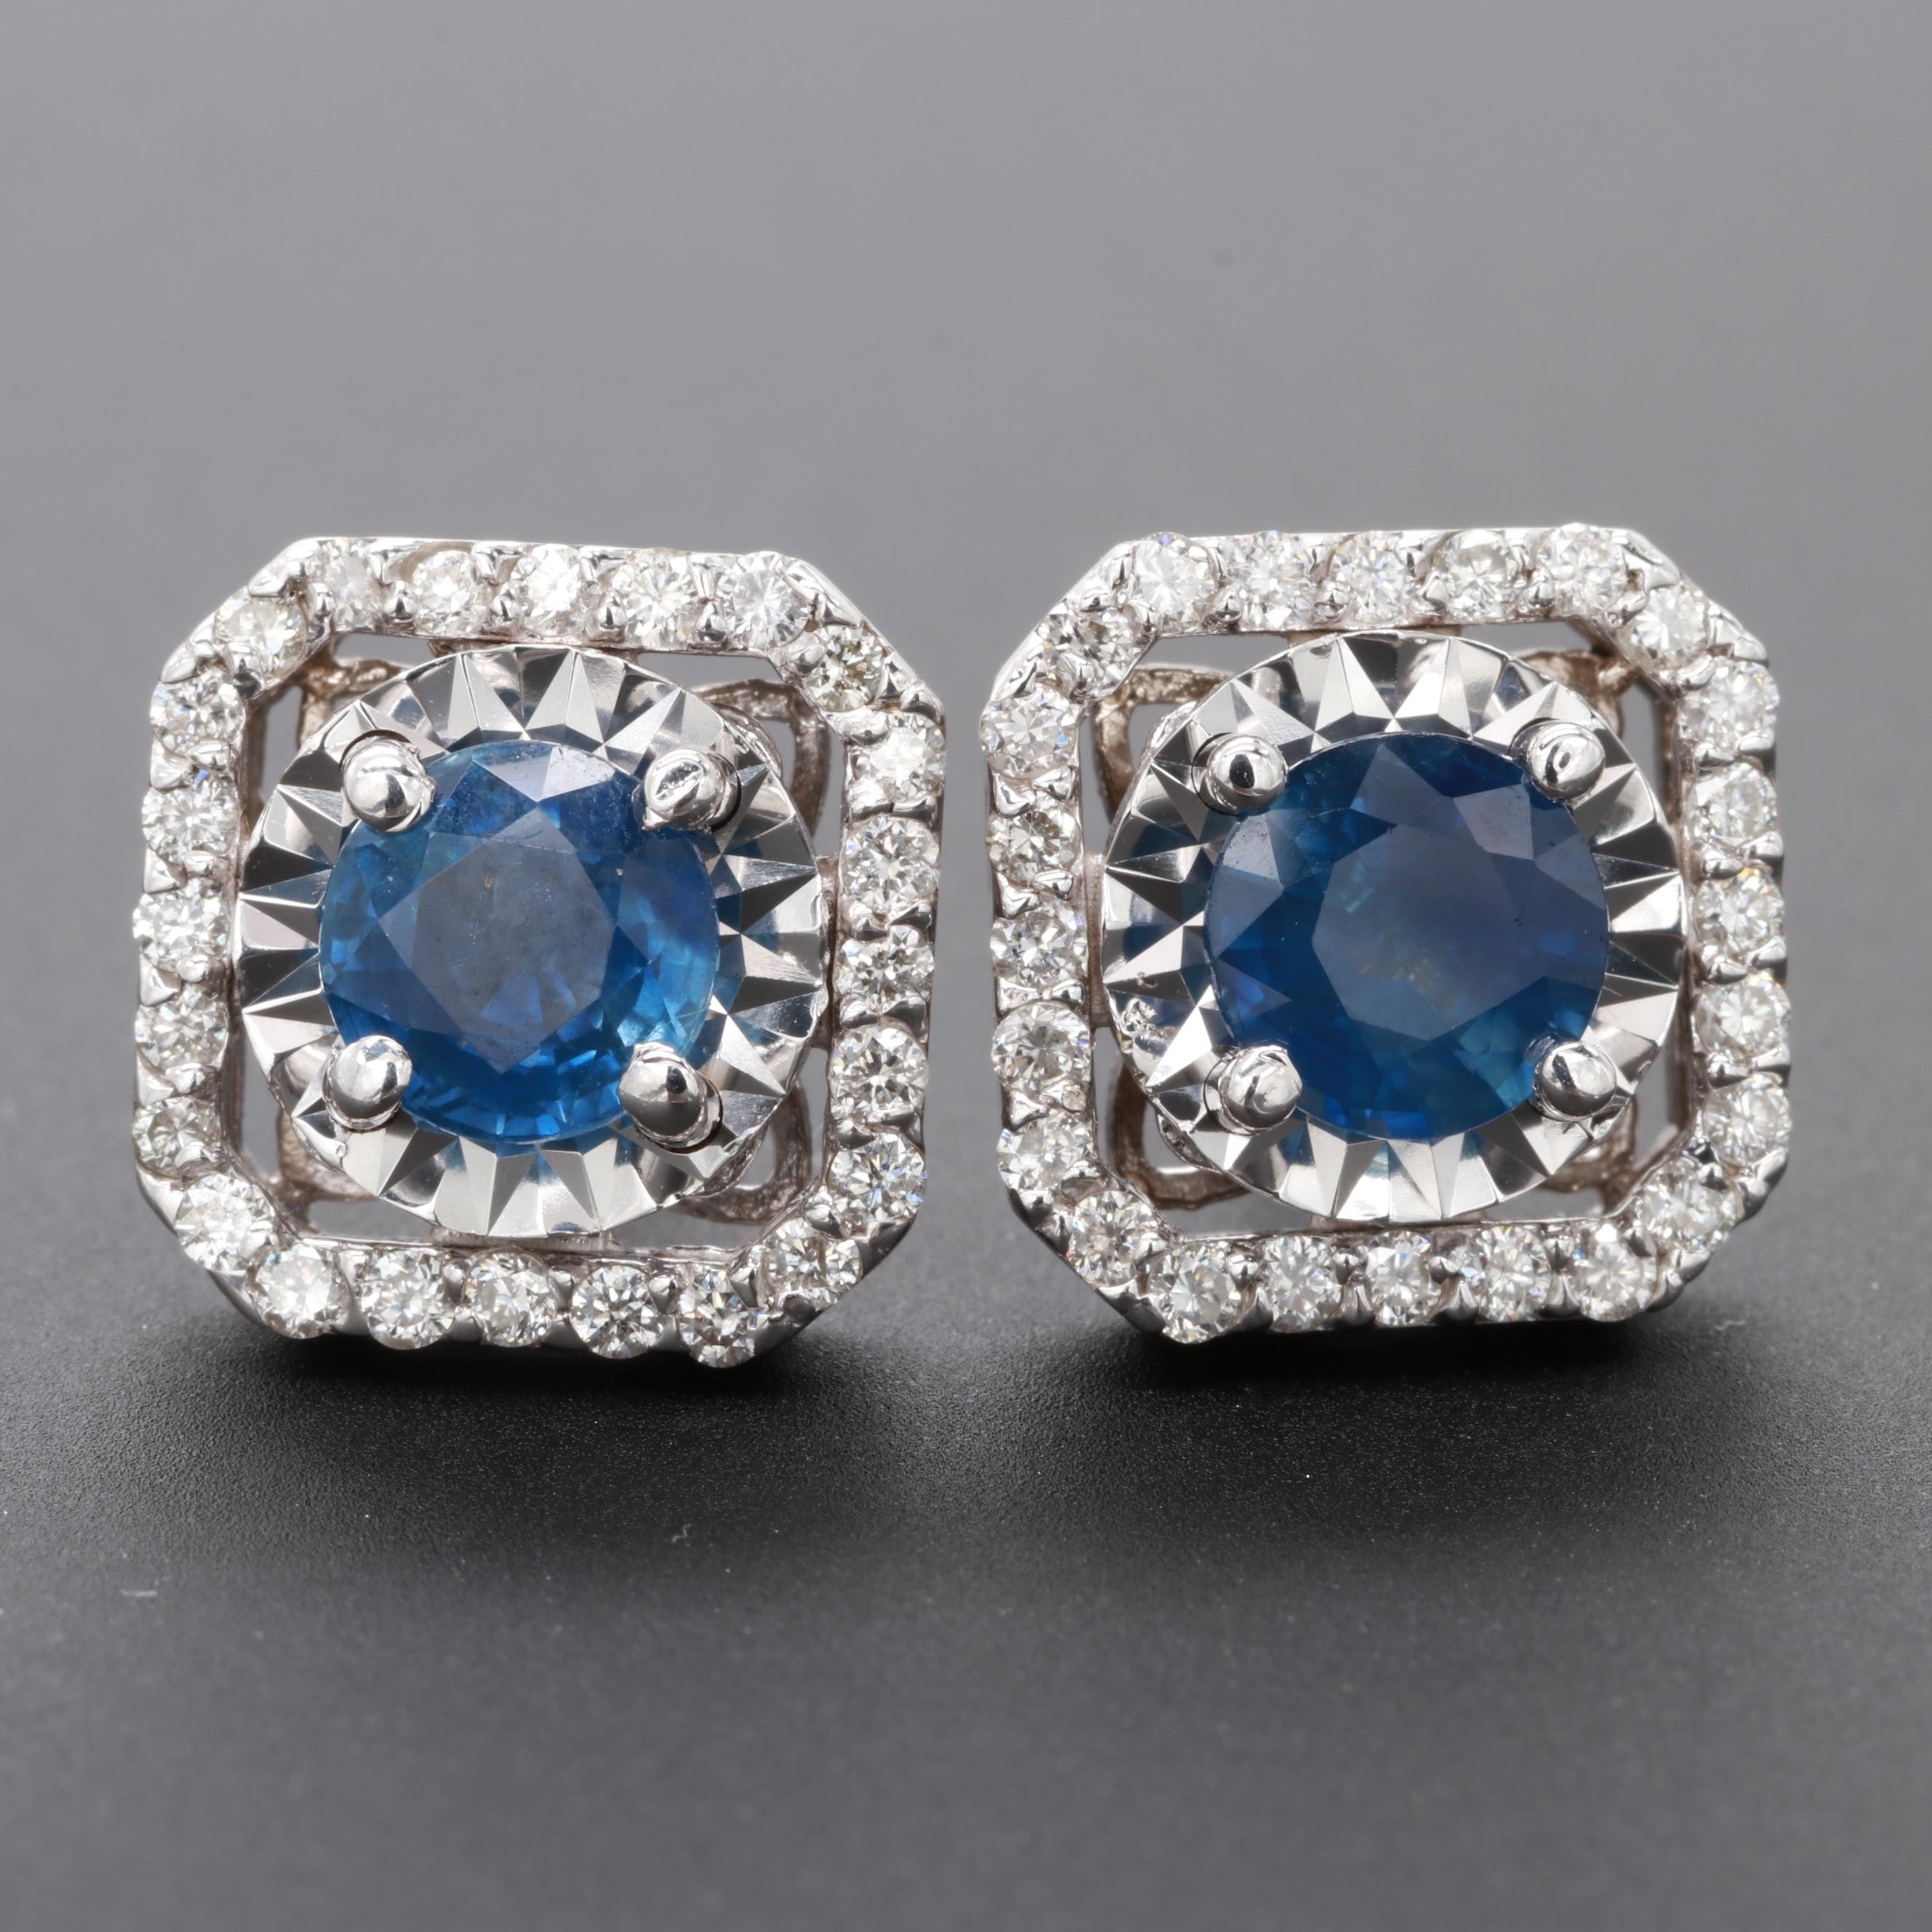 14K White Gold Blue Sapphire and Diamond Earrings